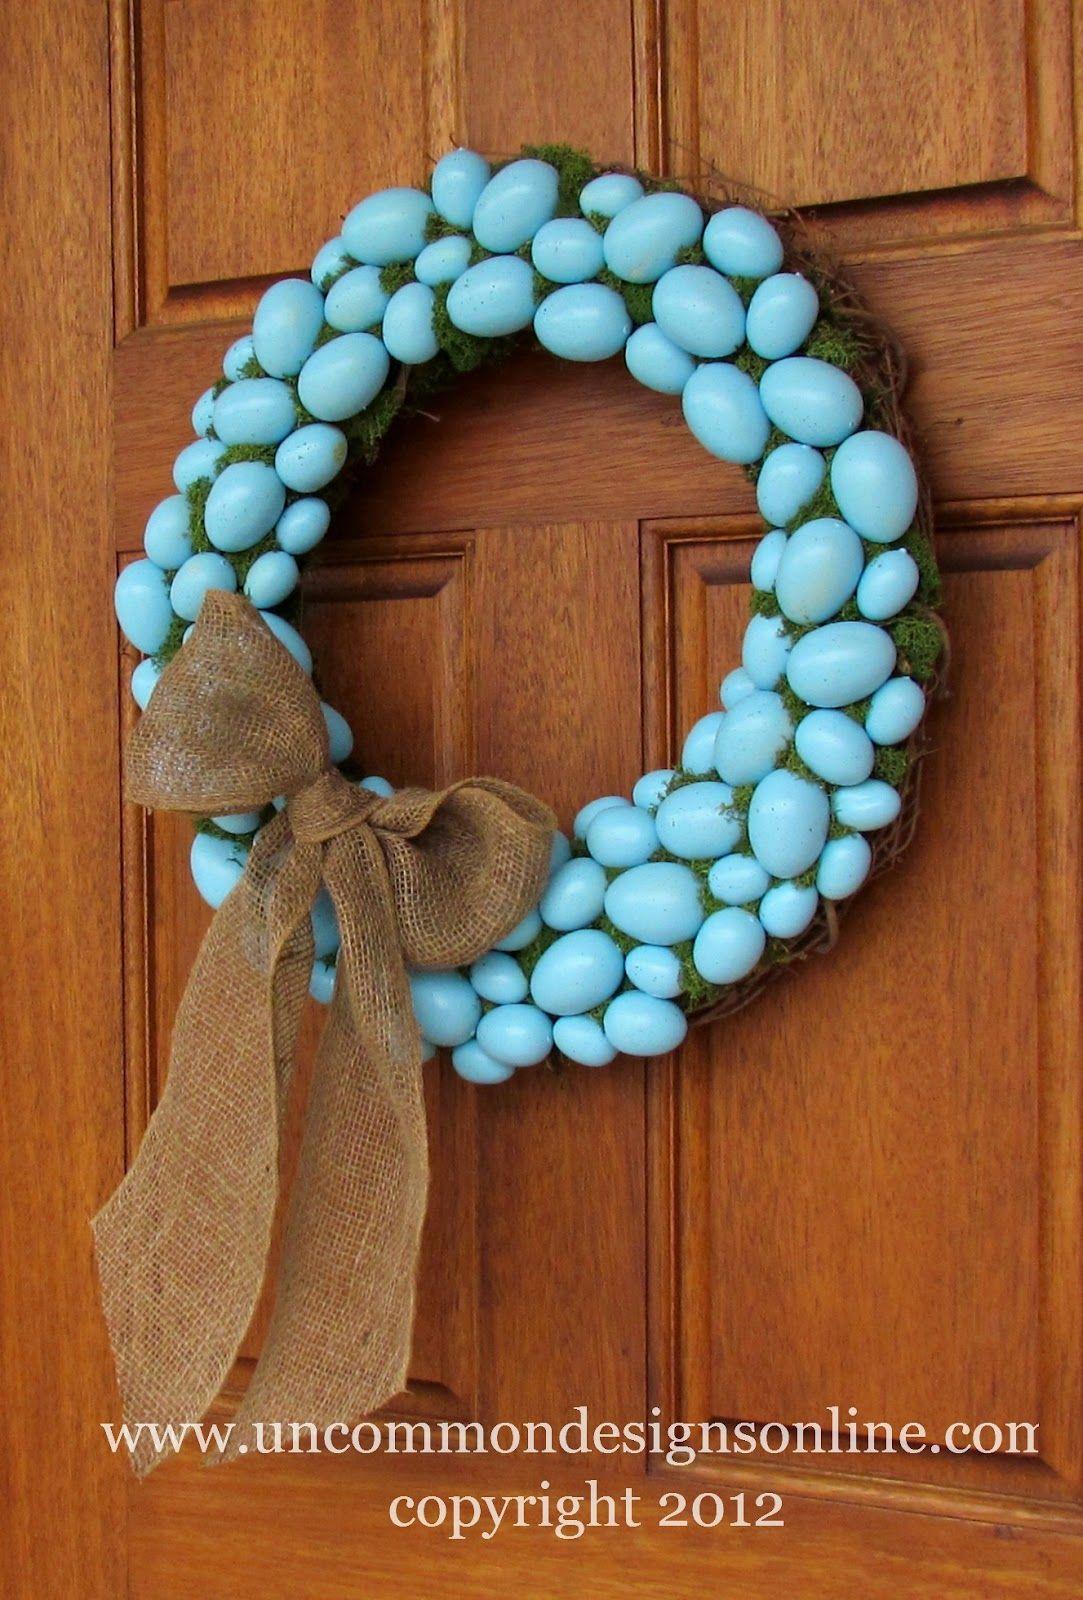 Robin's Egg Blue Easter Wreath { A Tutorial }